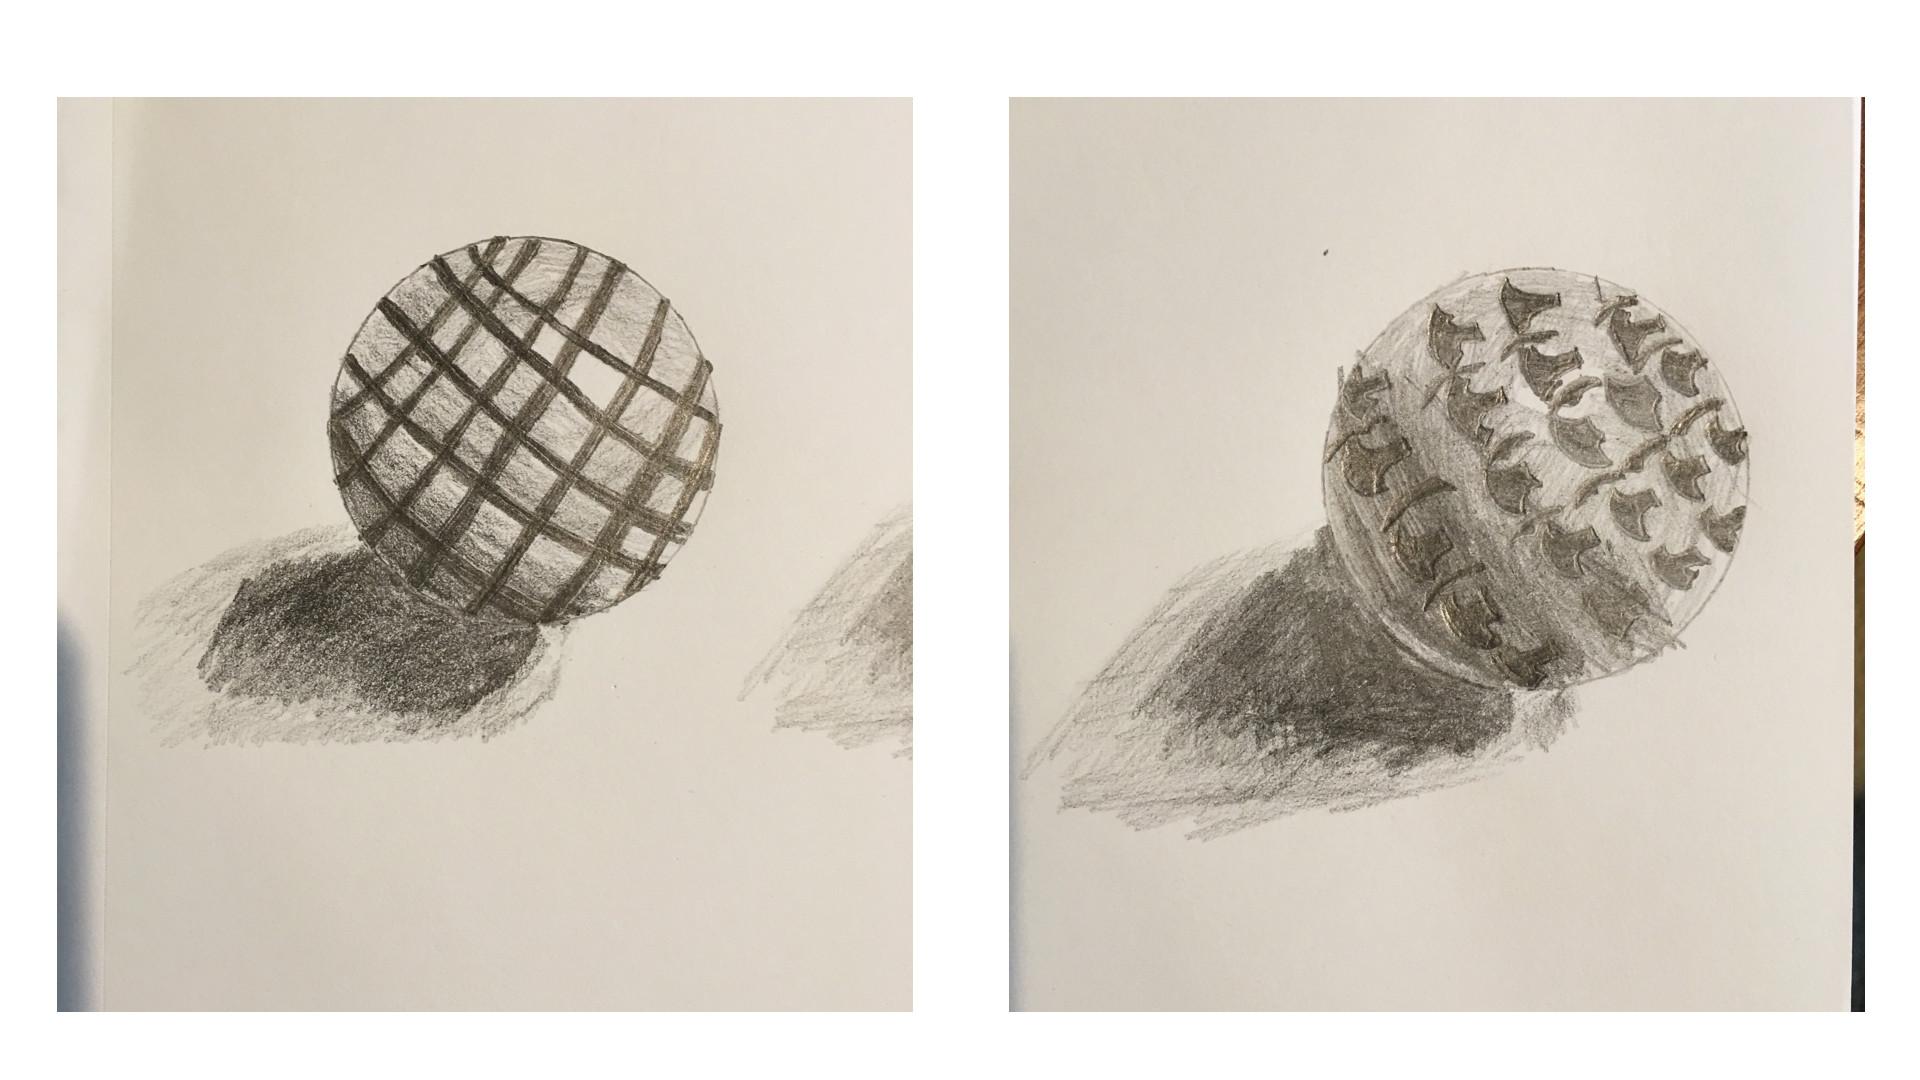 Chris hendrickson hendrickson chris 3f2 art1 o 1609